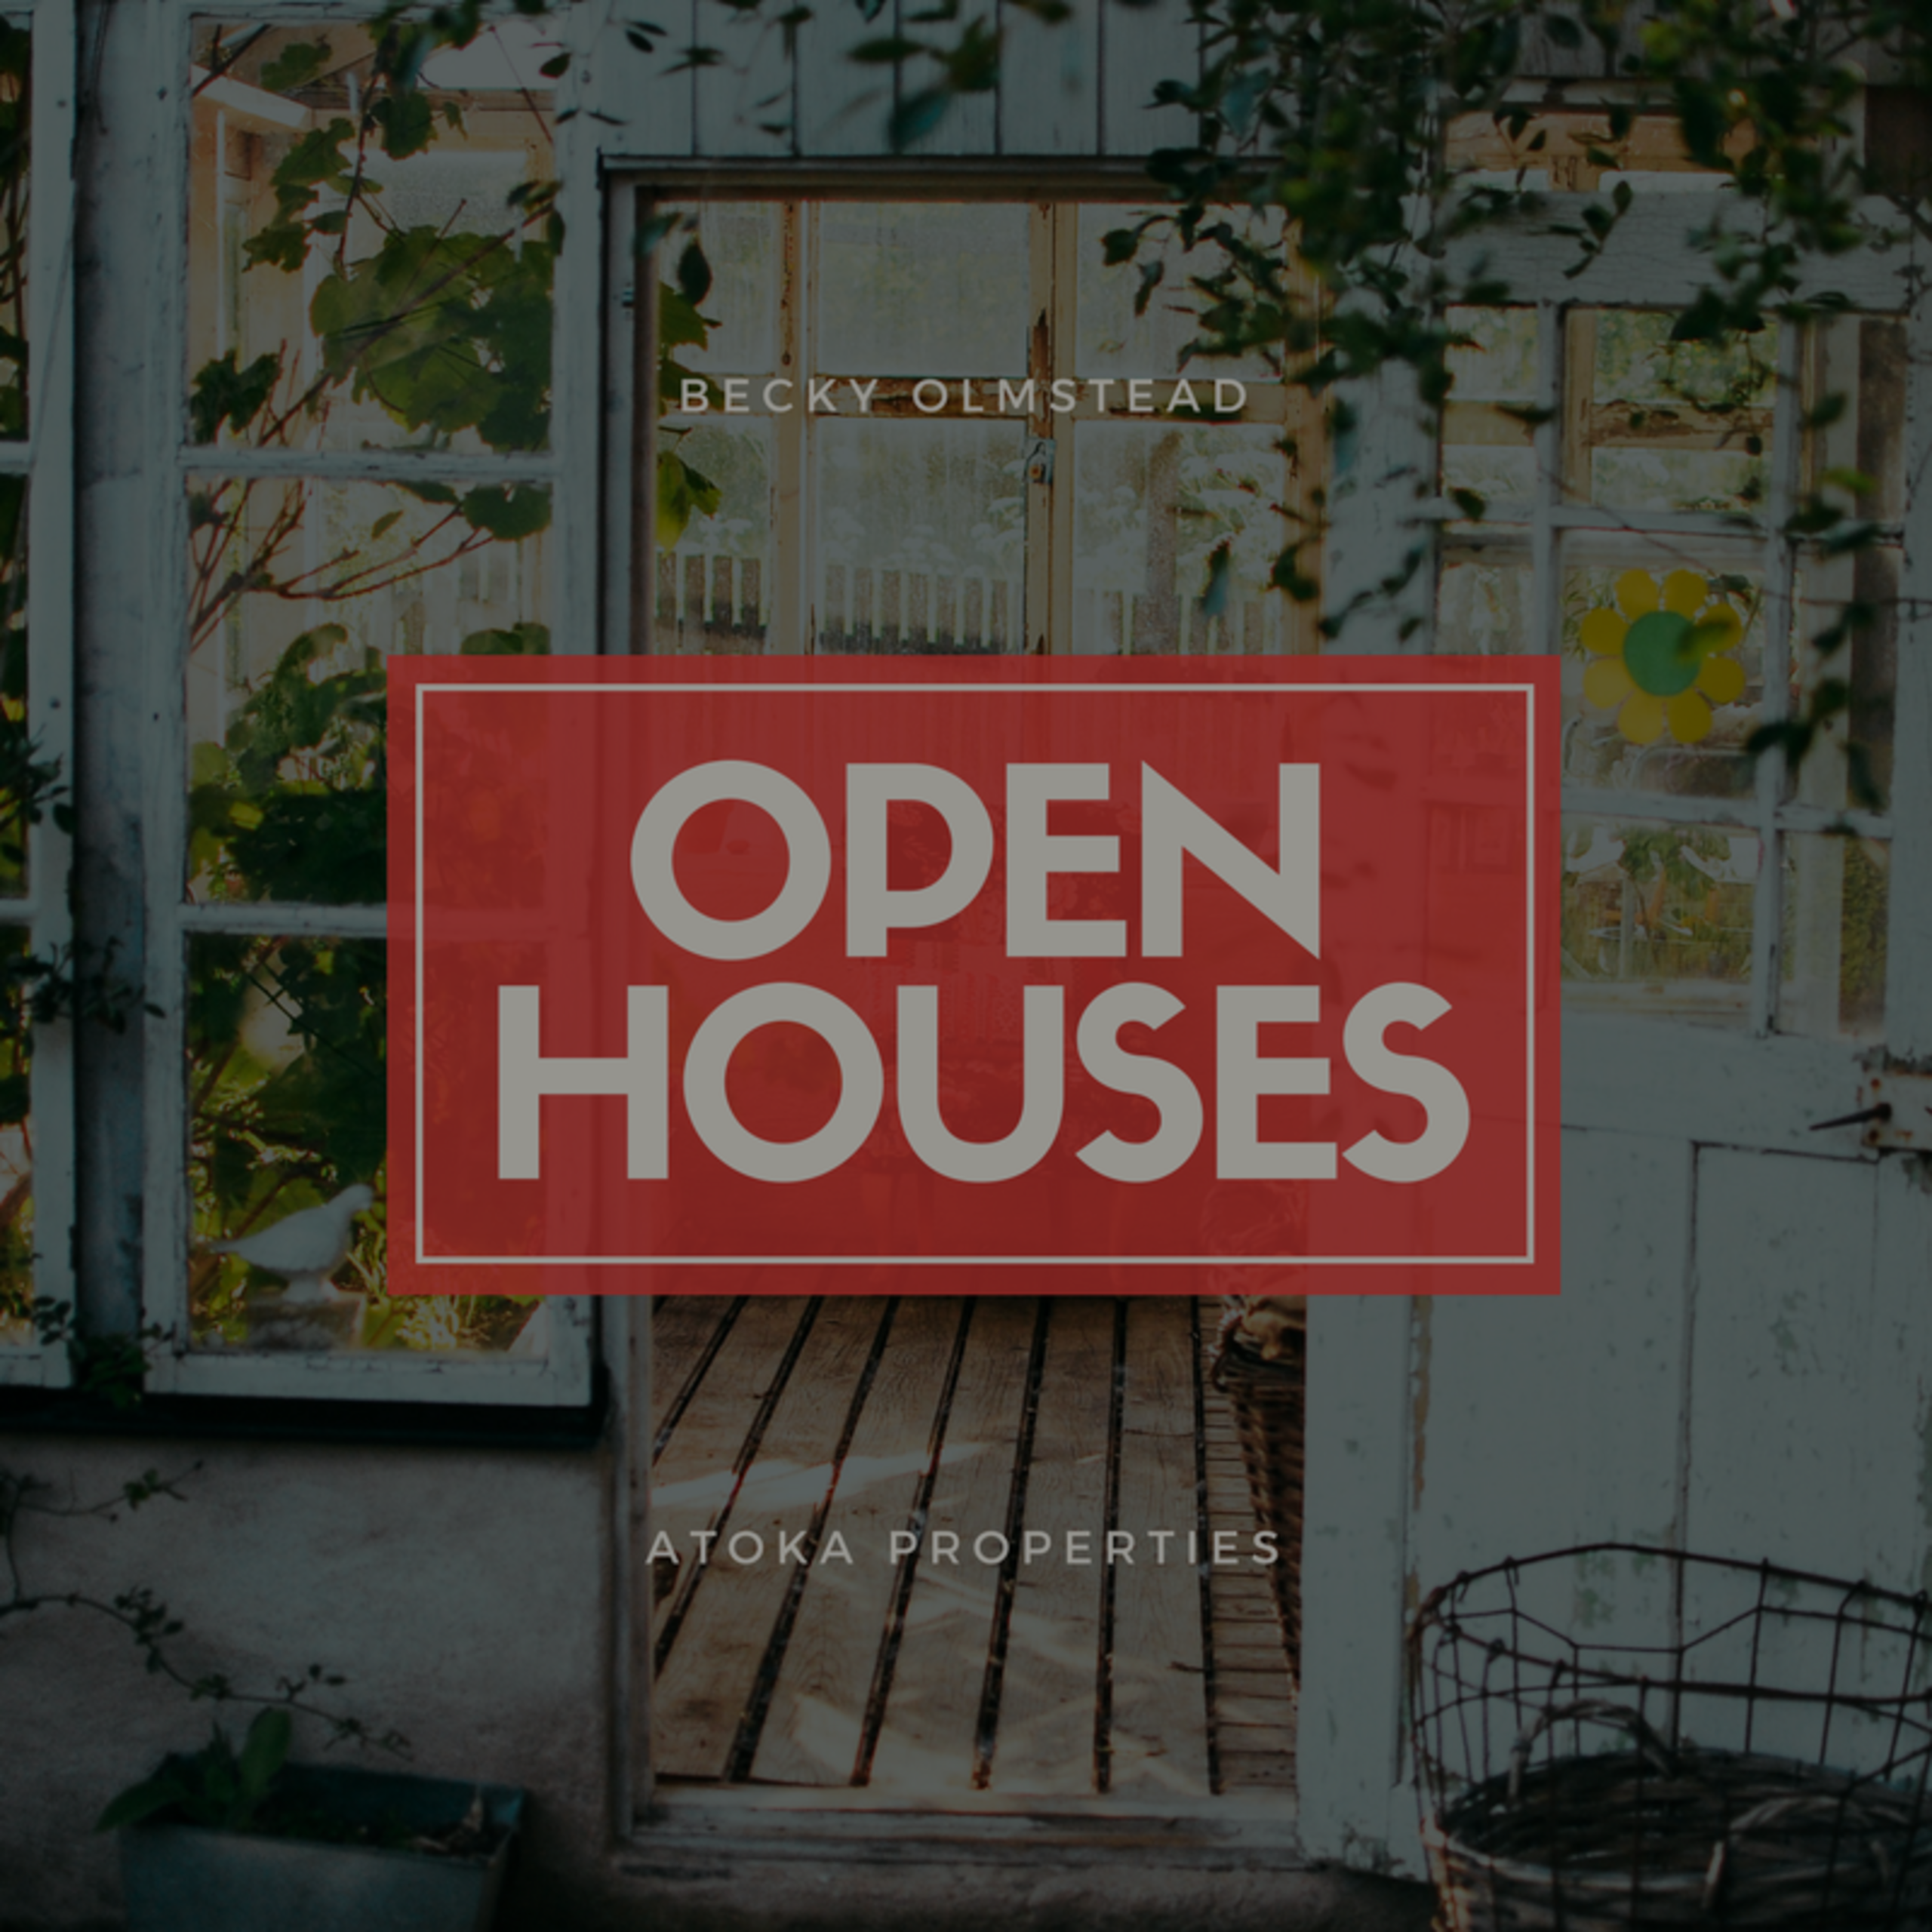 OPEN HOUSE LIST 12/30/17 – 12/31/17